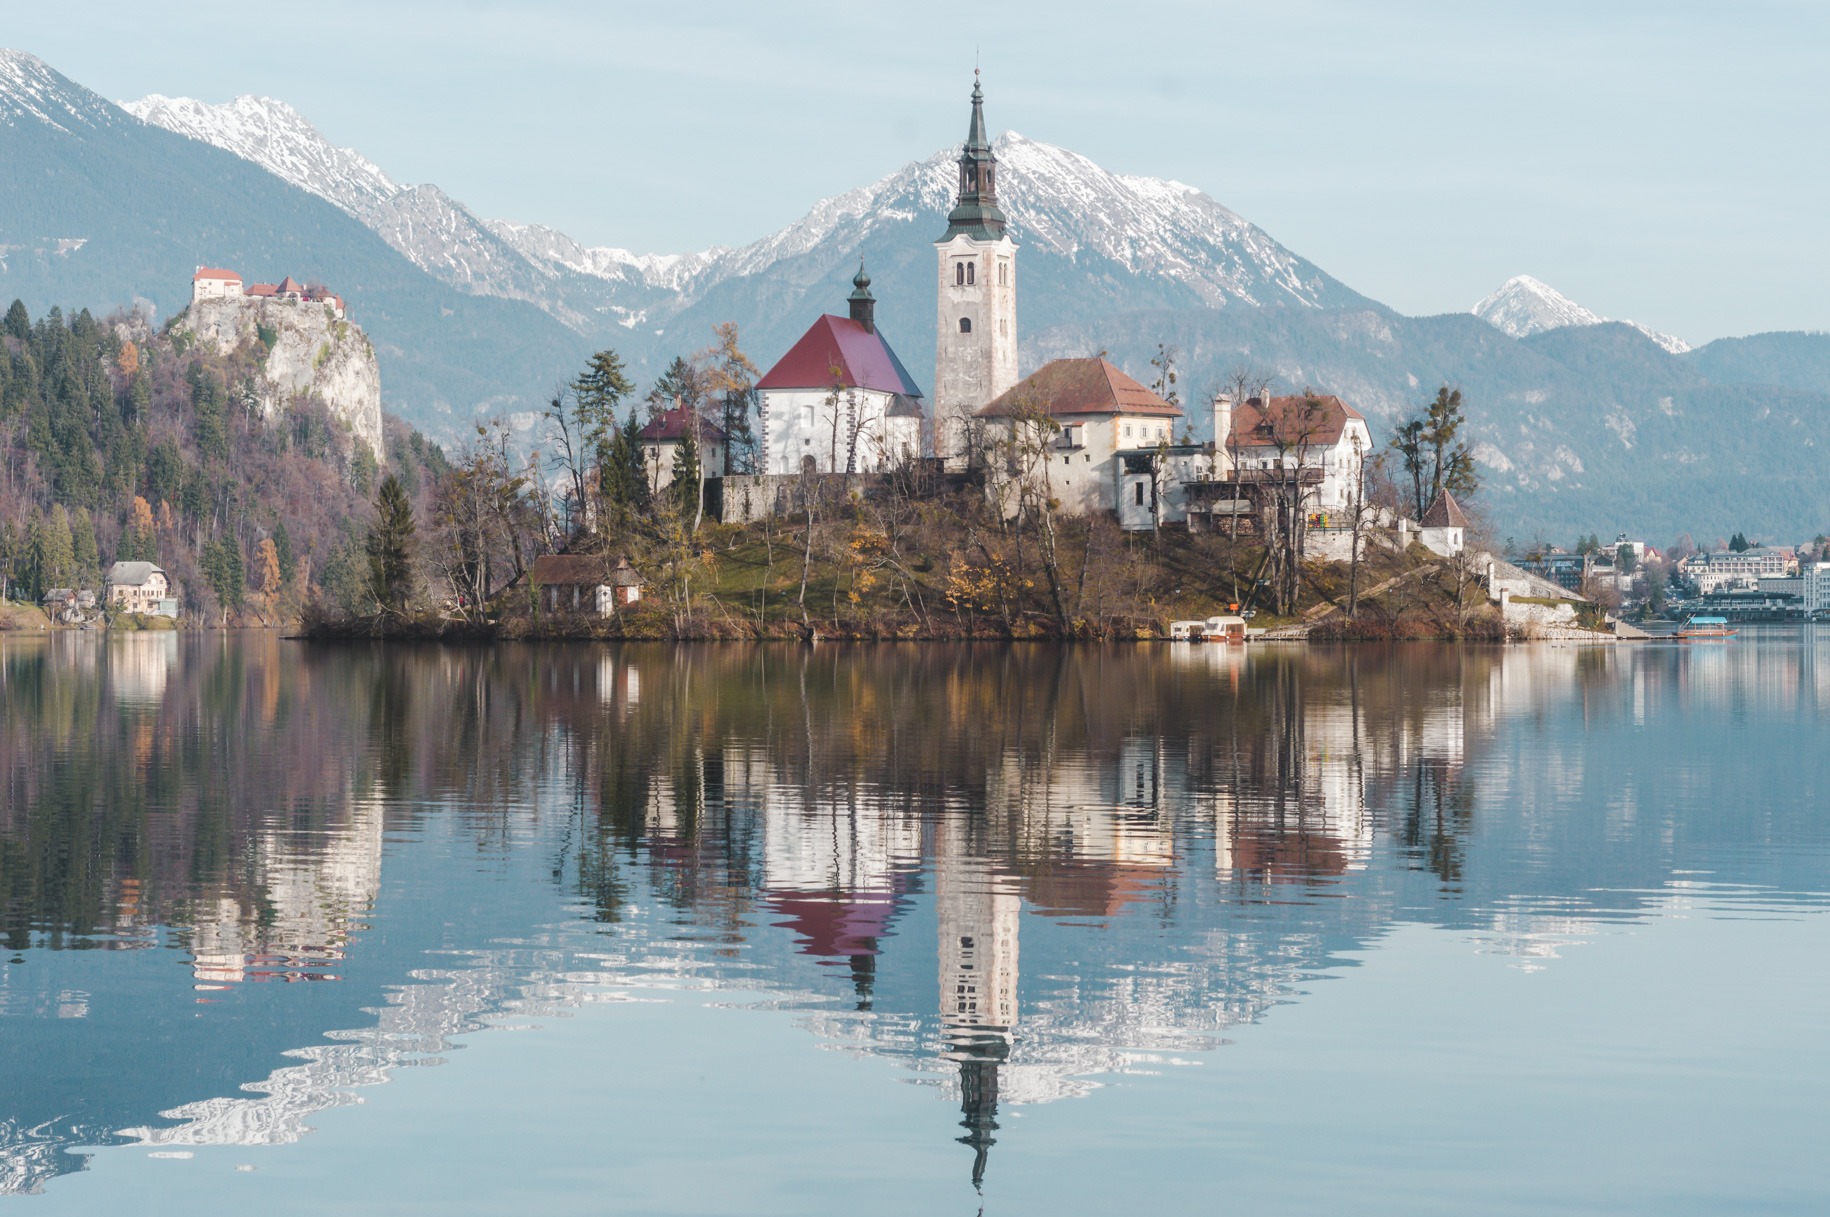 2017 travel highlight: visiting Lake Bled, Slovenia.